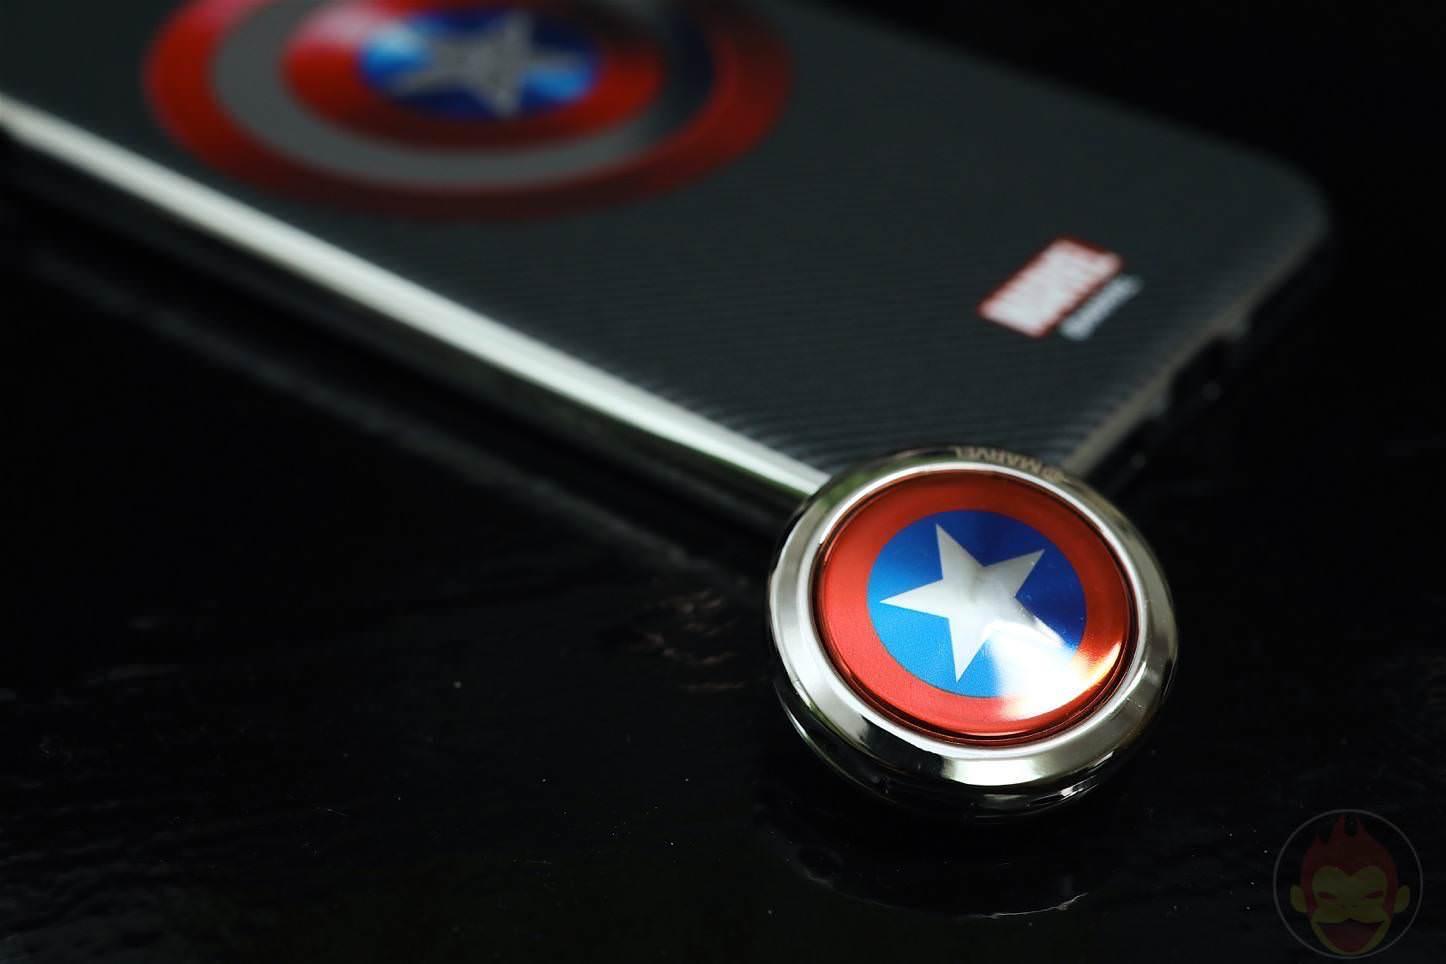 MARVEL-Design-iPhone-7-Plus-Case-and-Ring-05.jpg